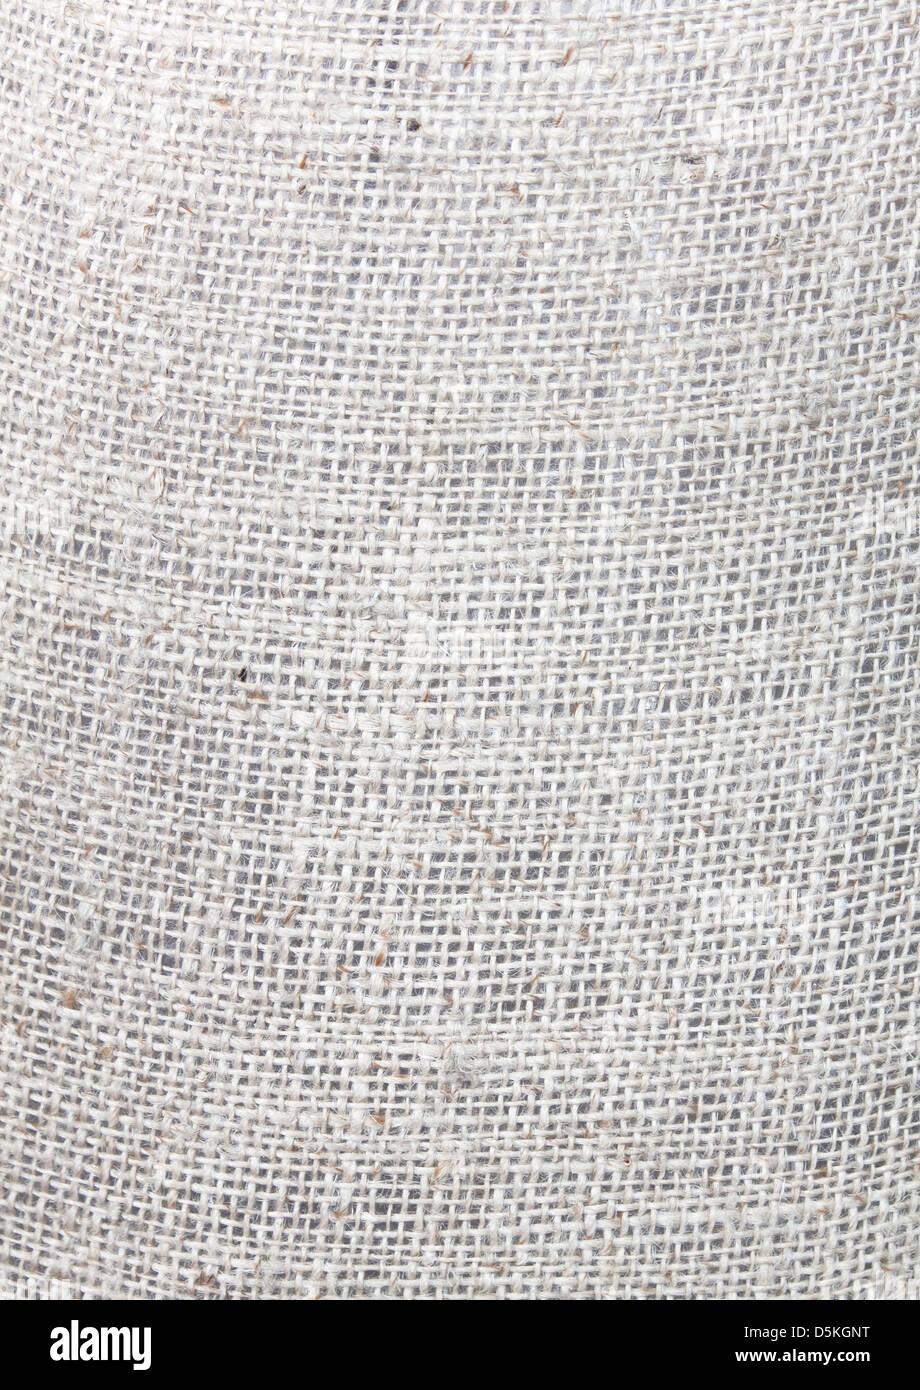 Close-up of natural burlap hessian Hemp rope - Stock Image